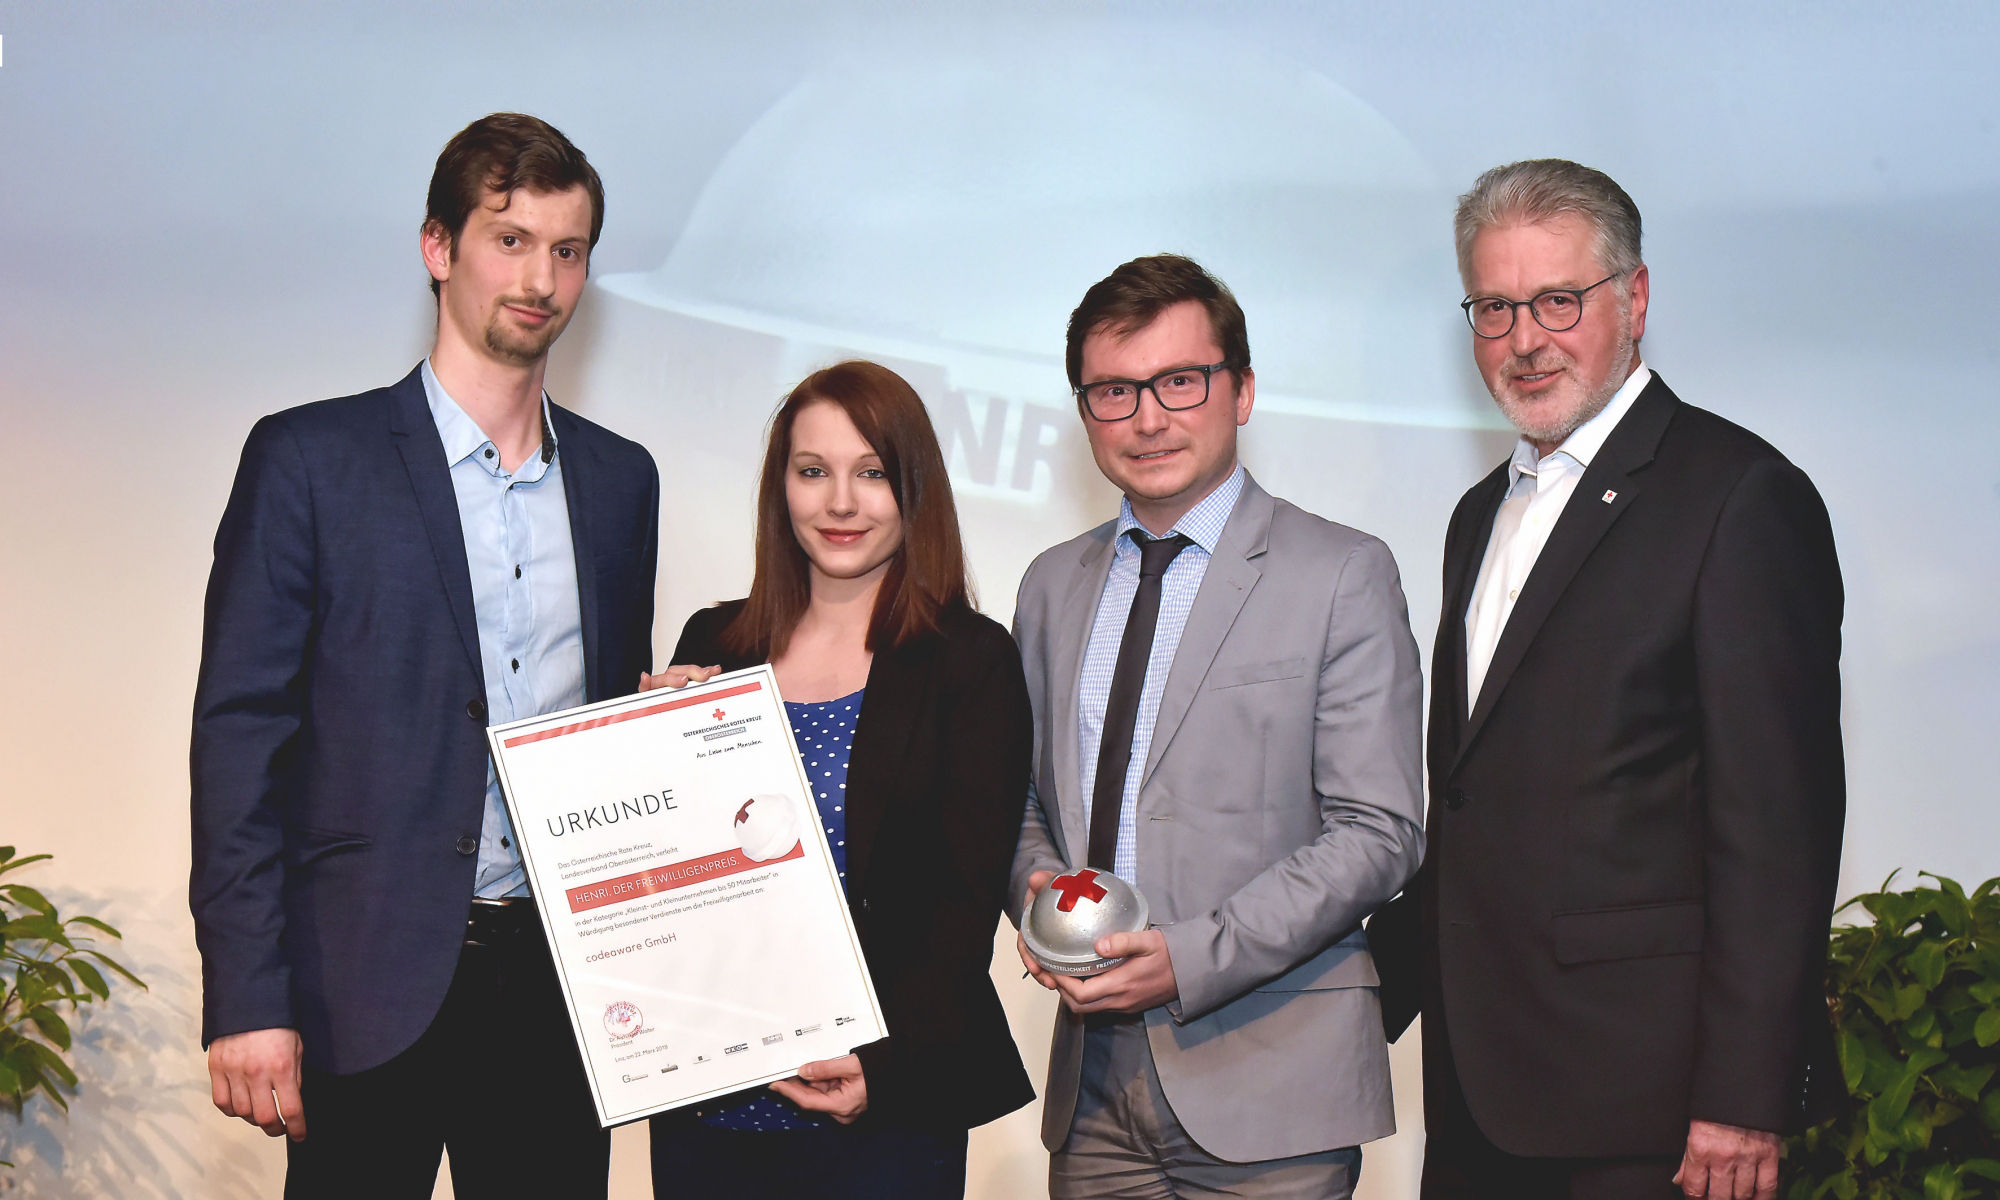 HENRI Preisverleihung codeaware GmbH